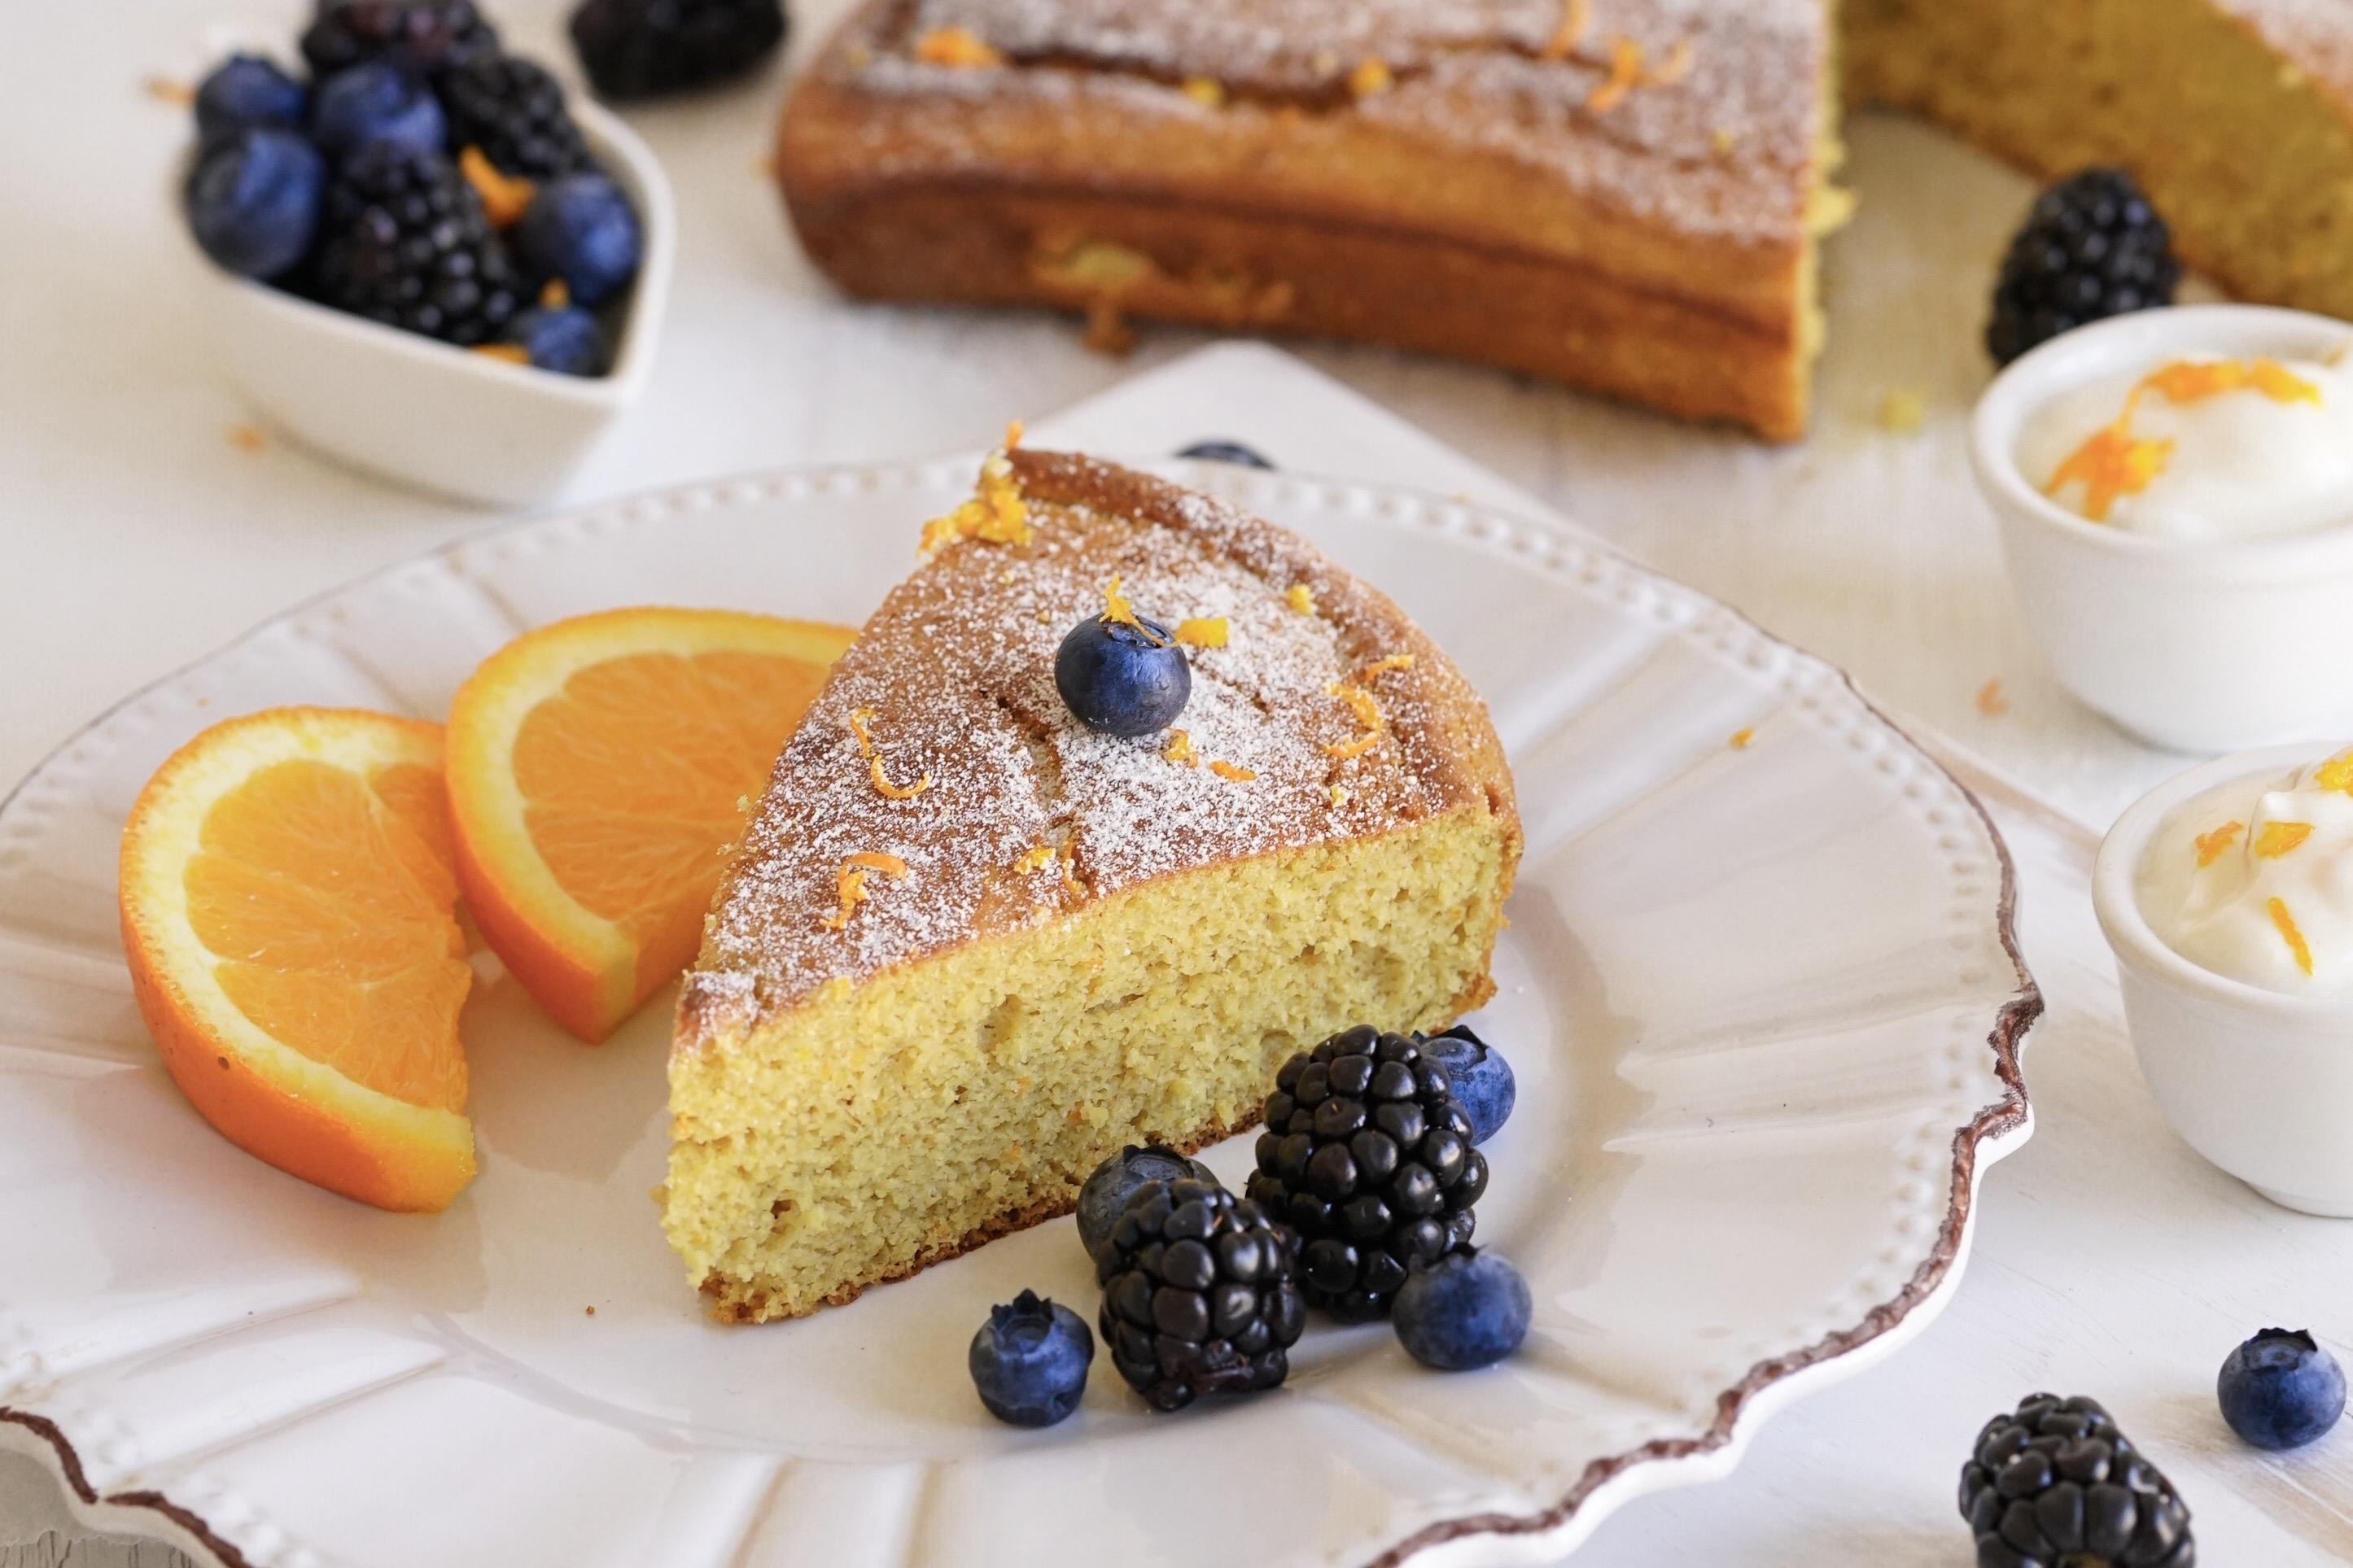 Paleo Orange Cake (Gluten, Dairy, Nut & Coconut Free)